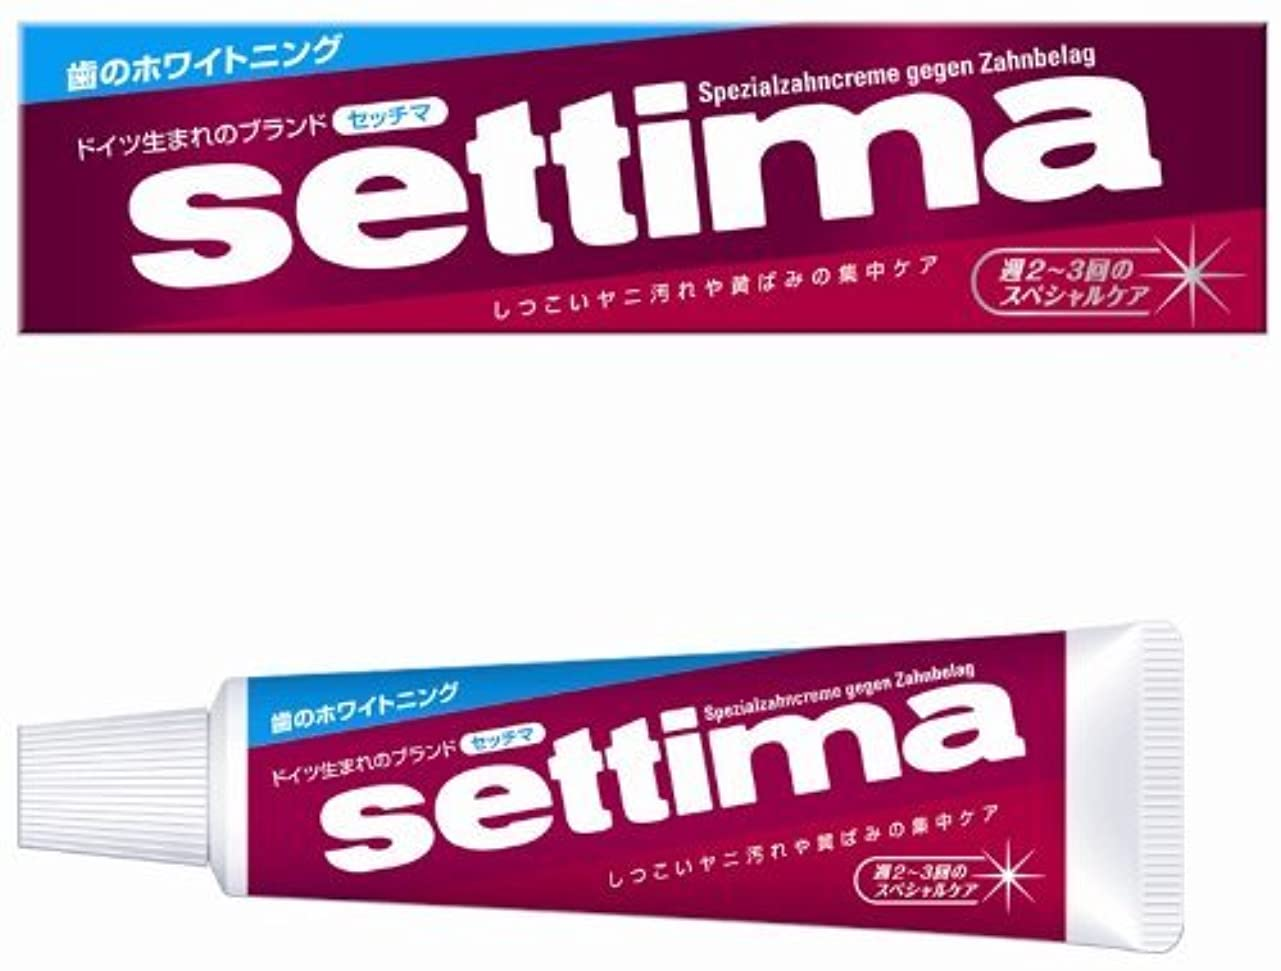 settima(セッチマ) はみがき スペシャル (箱タイプ) 40g